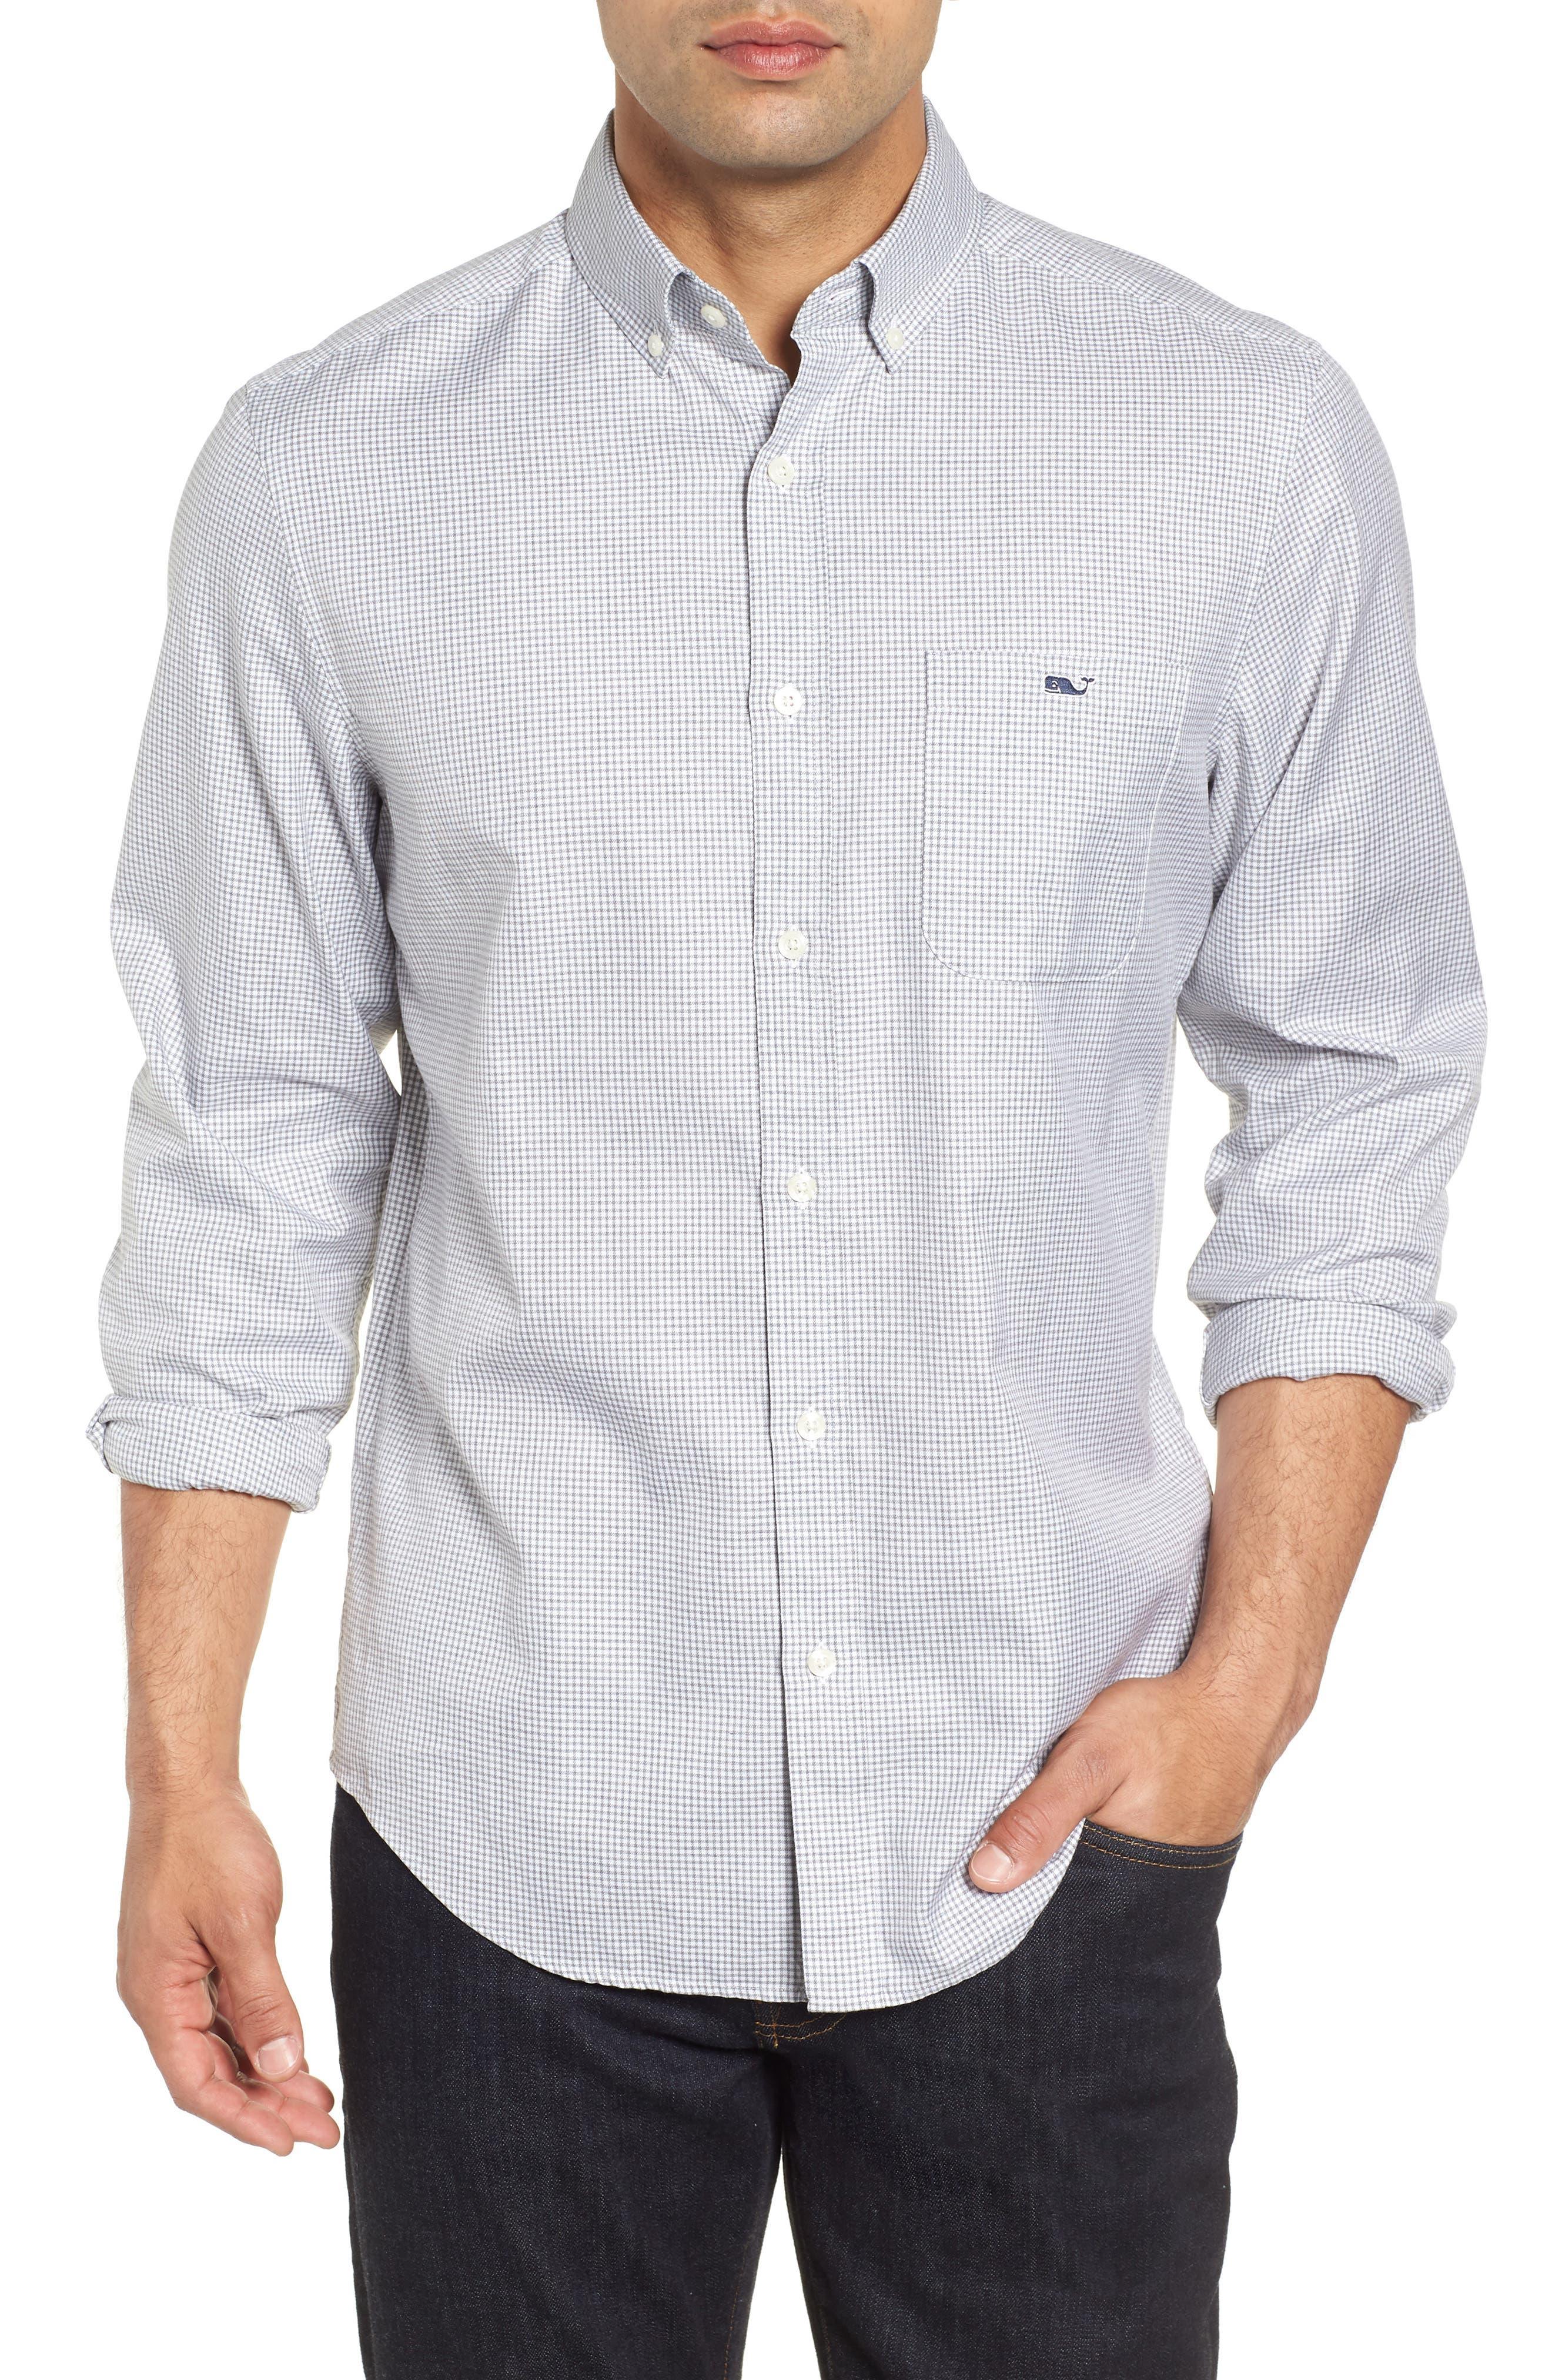 Kettle Cove Regular Fit Gingham Sport Shirt,                             Main thumbnail 1, color,                             BARRACUDA